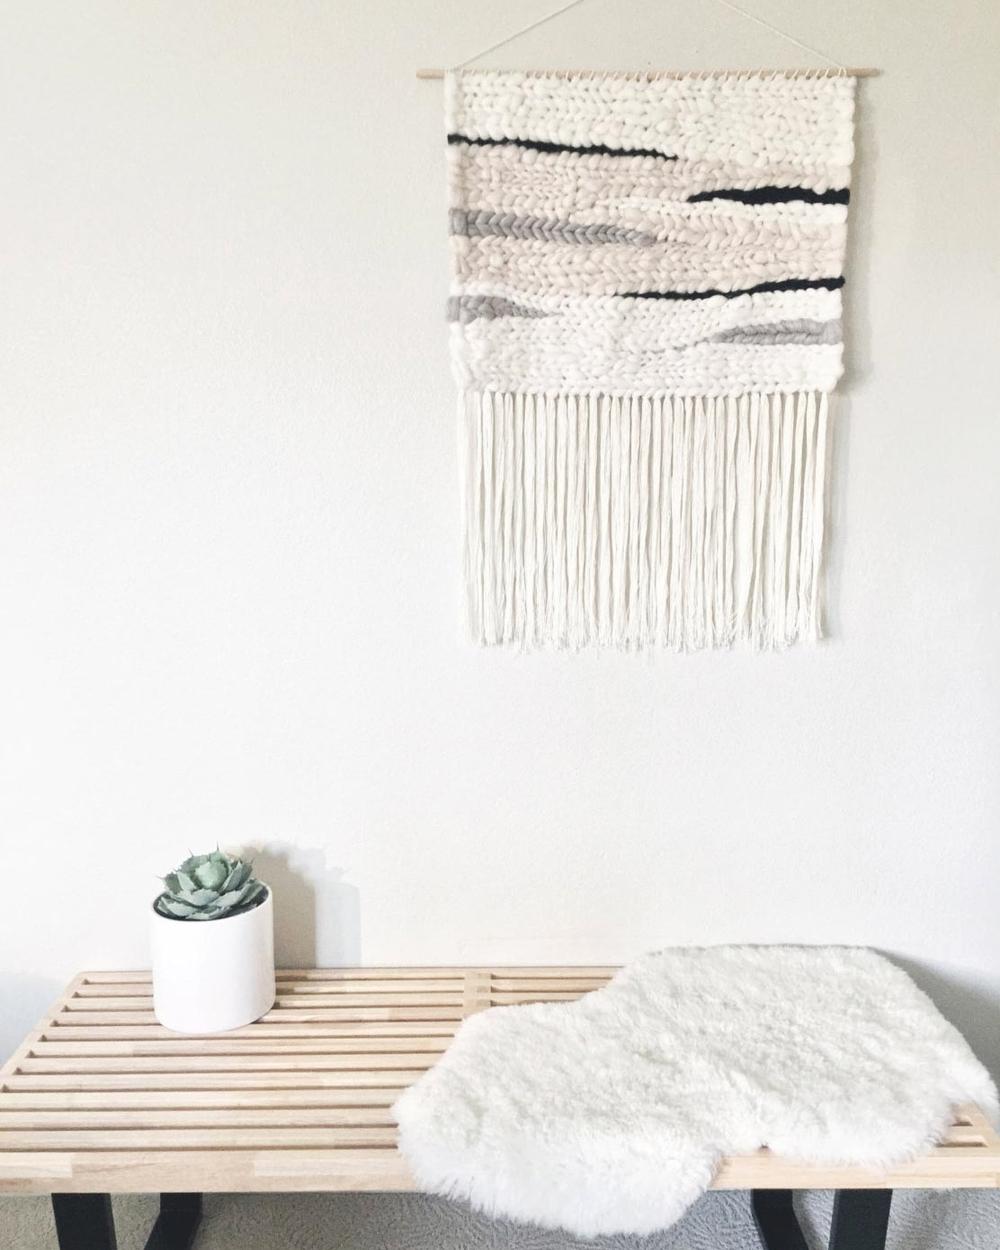 woven-wall-hangings.jpg